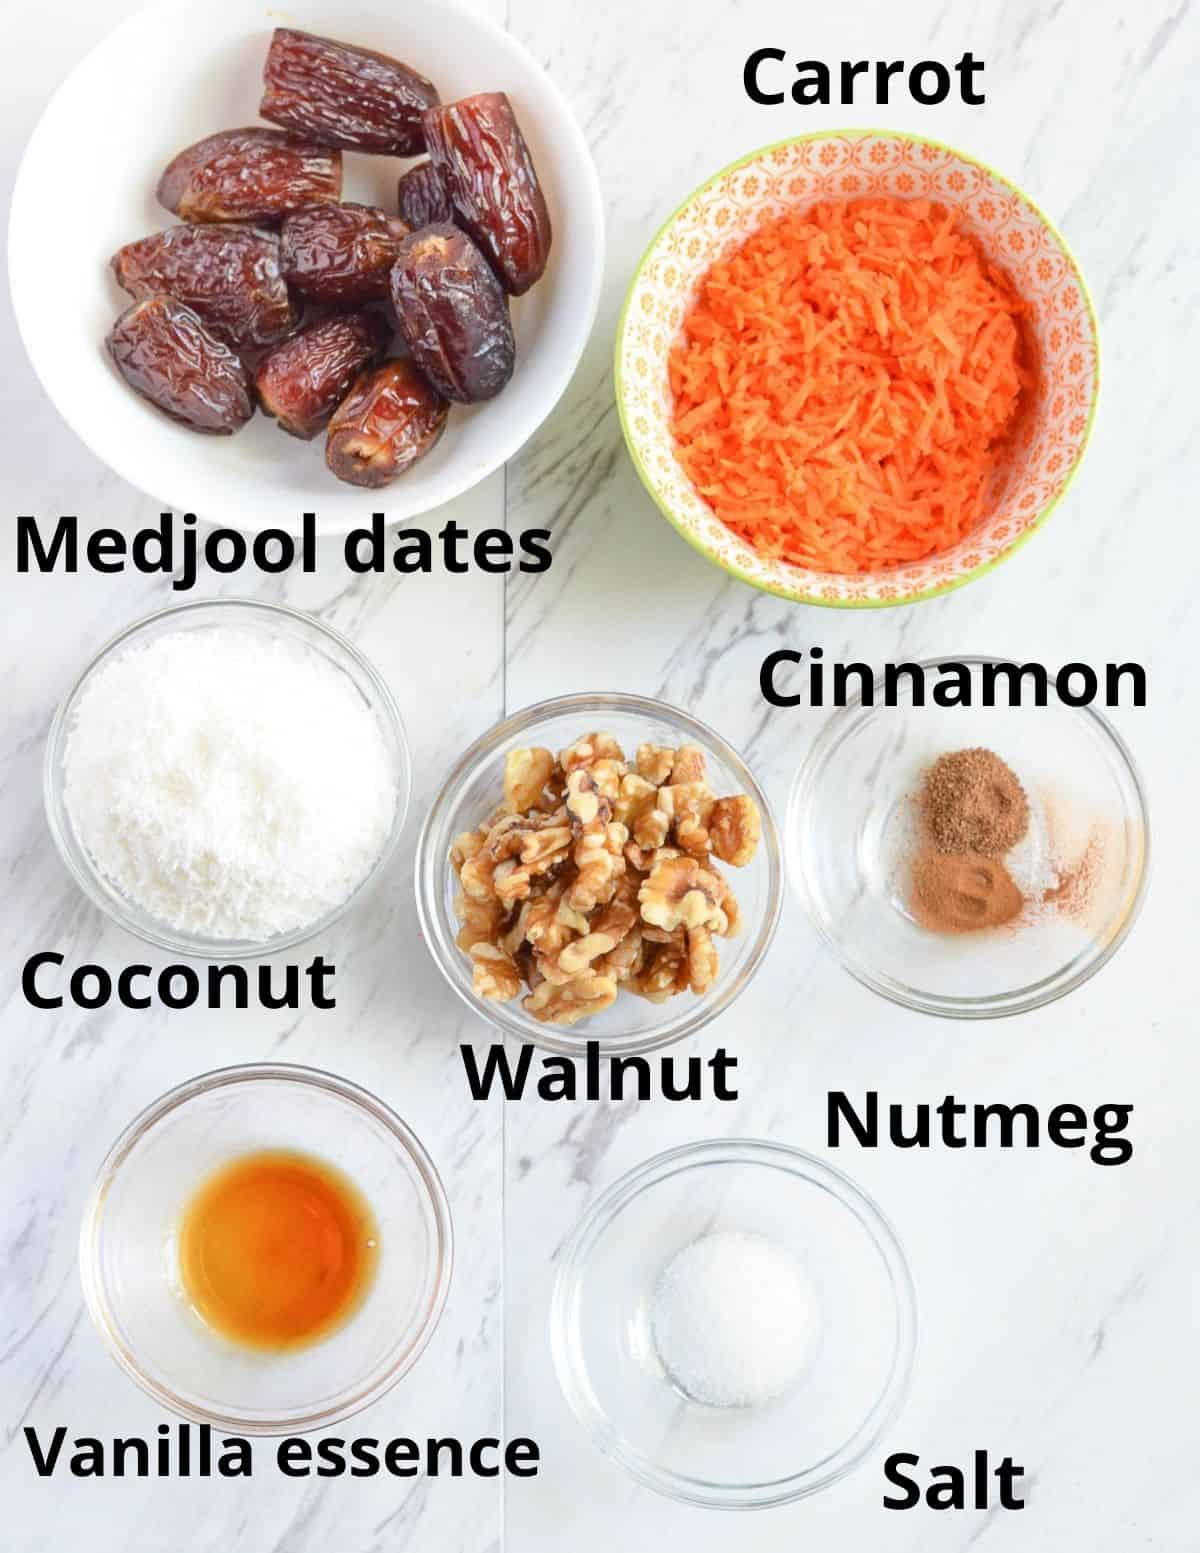 medjool dates, shredded carrot, vanilla essence, desiccated coconut, walnuts, cinnamon, nutmeg & salt is required.